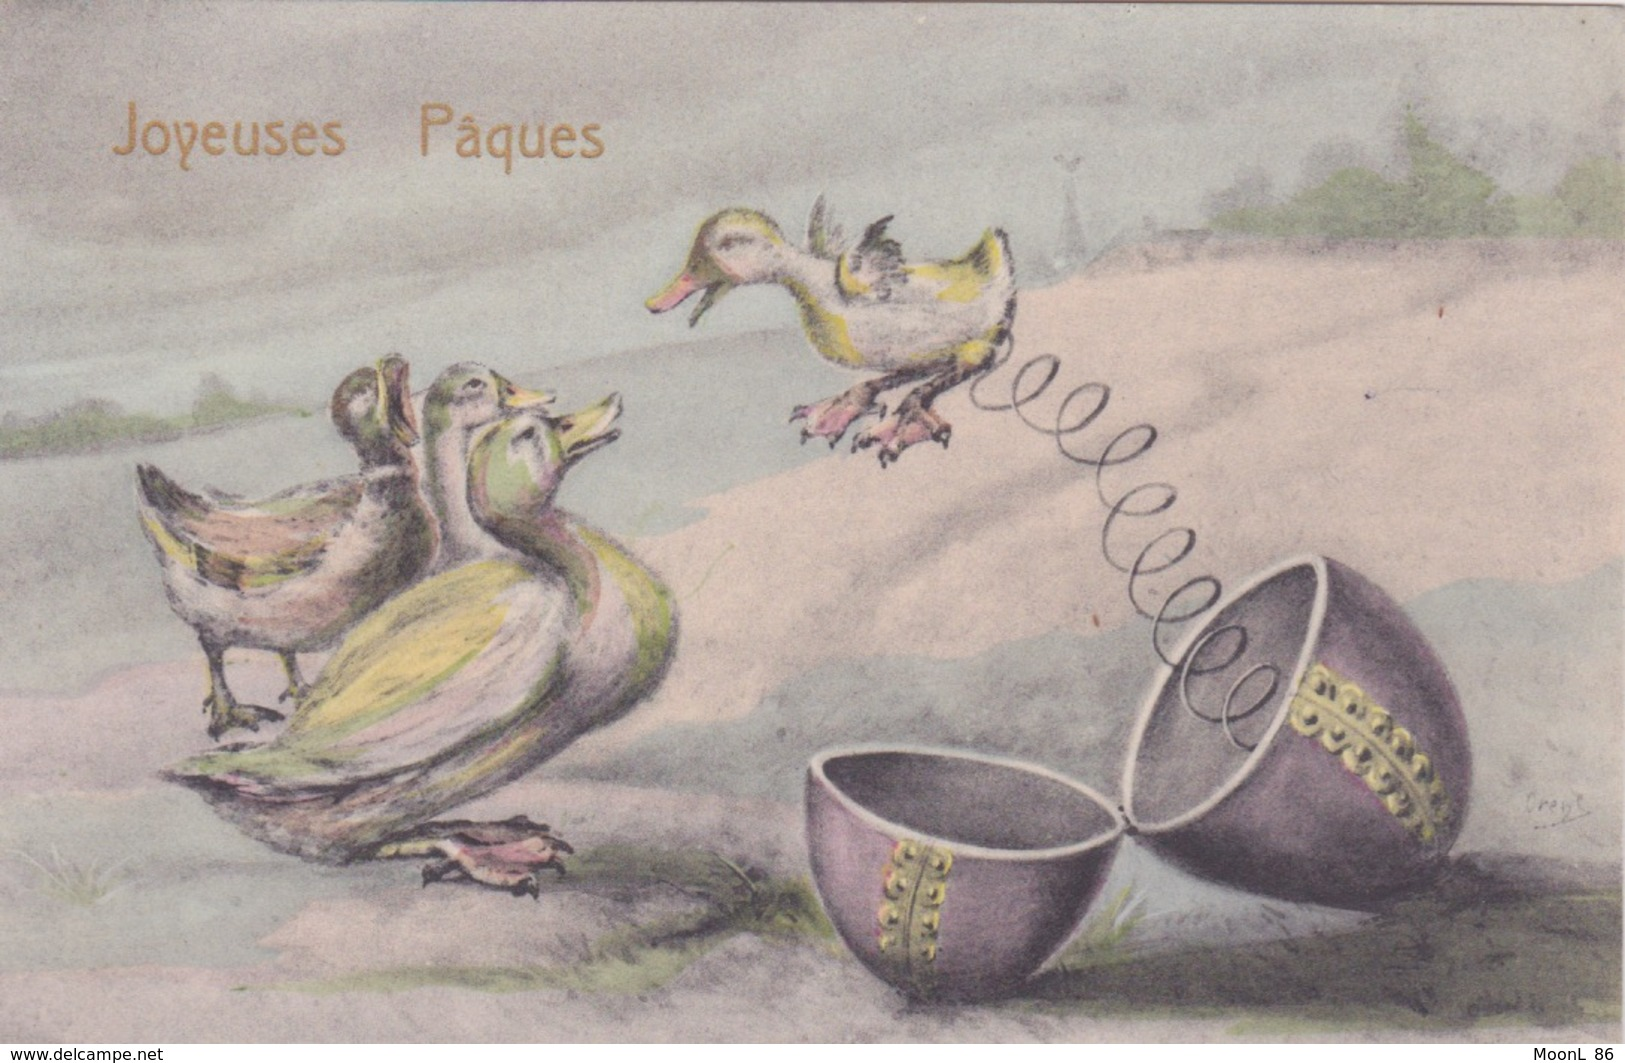 JOYEUSES  PAQUES - PAQUE - POUSSI N CANARD OEUF - Pâques